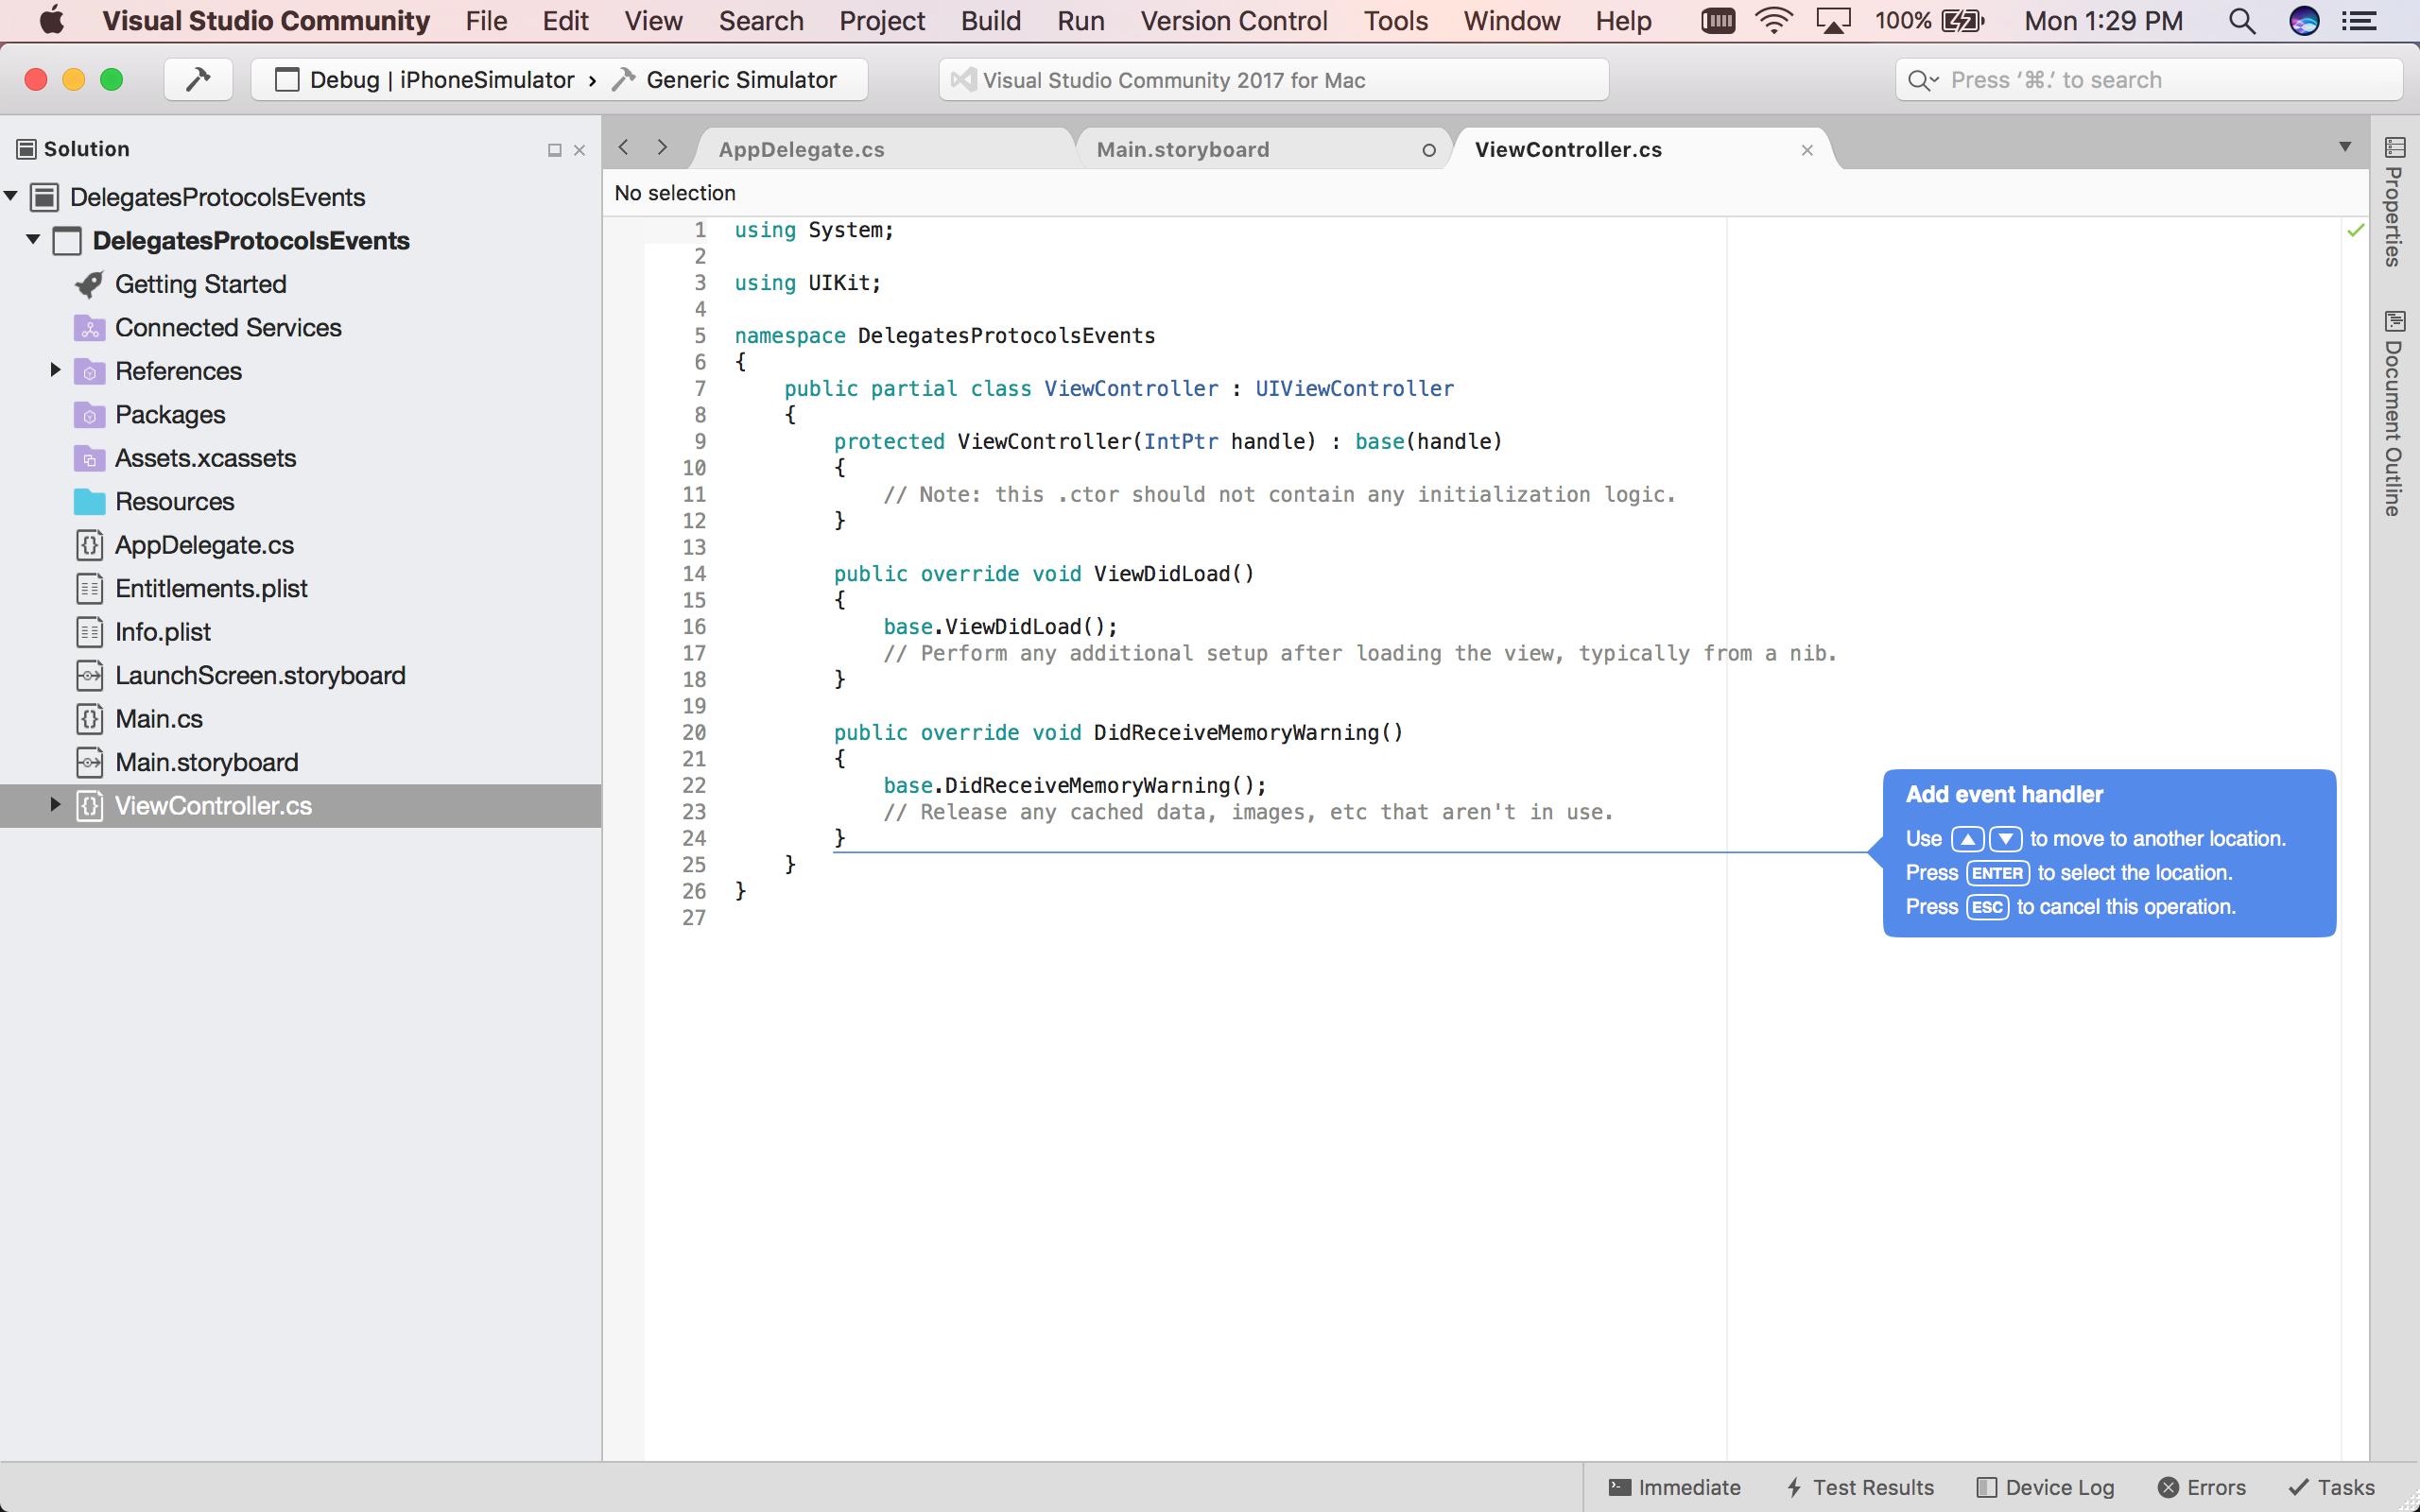 Events, Protocols and Delegates in Xamarin iOS - Xamarin | Microsoft